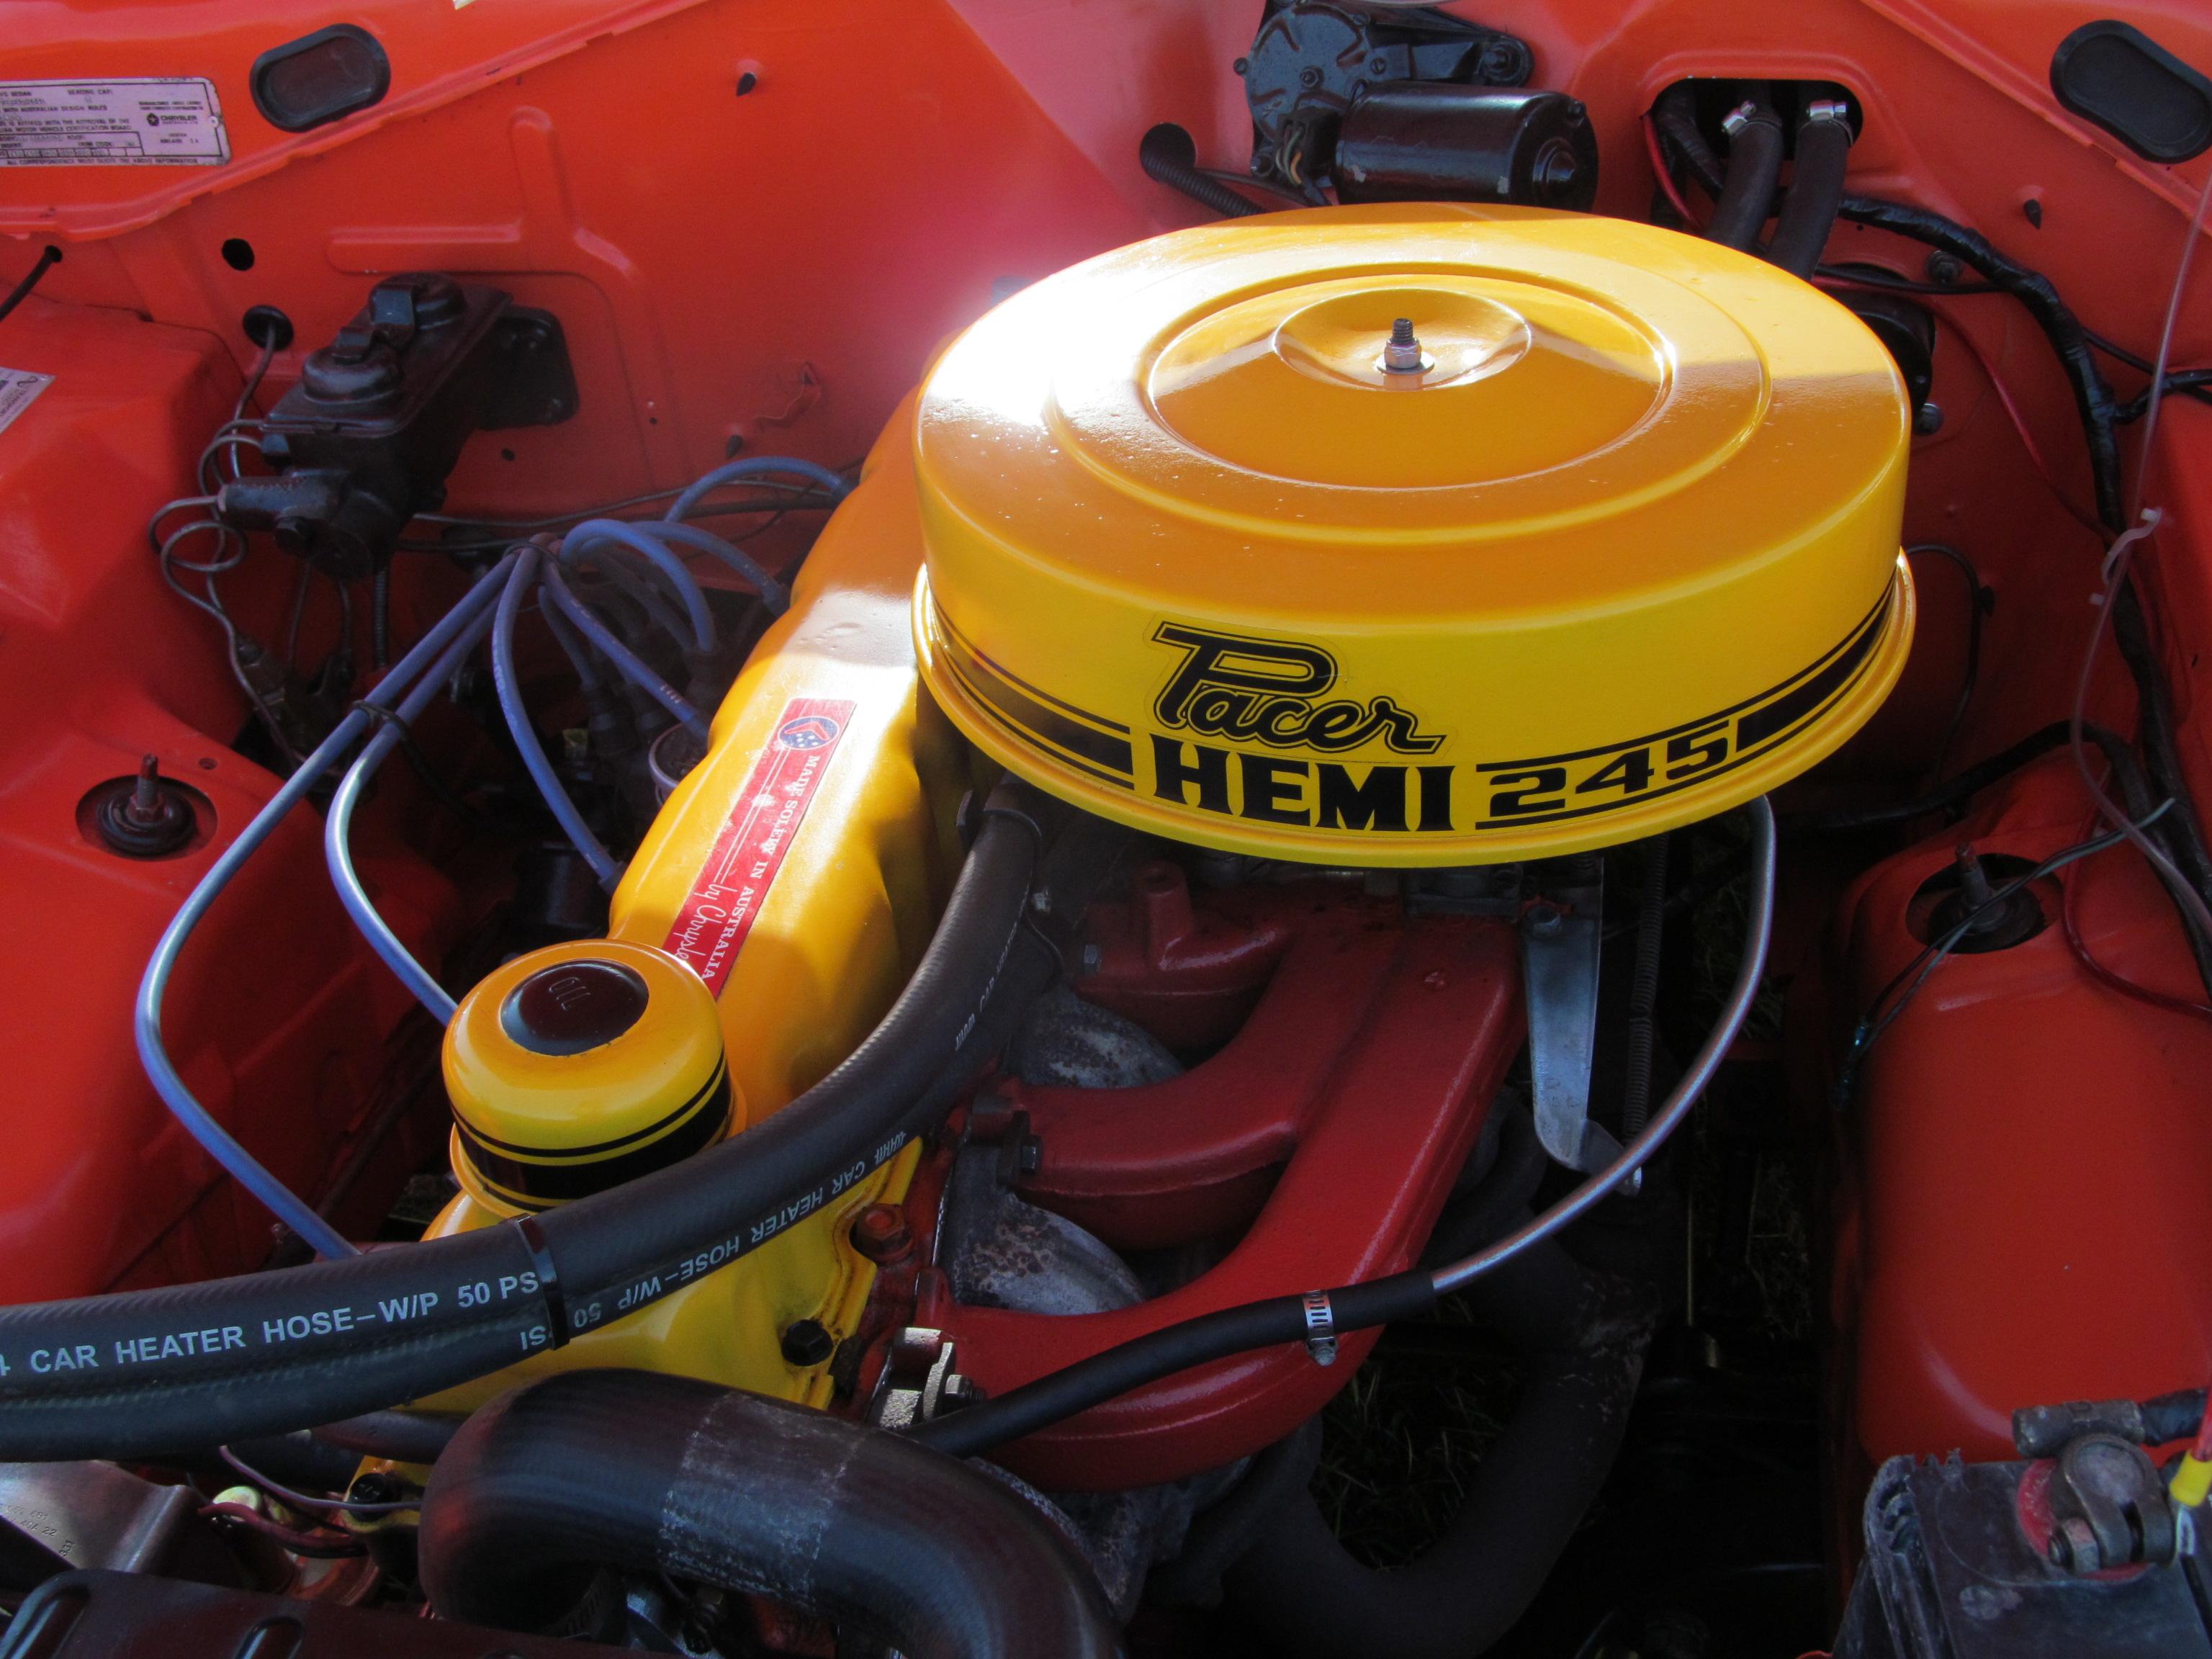 chrysler hemi-6 engine